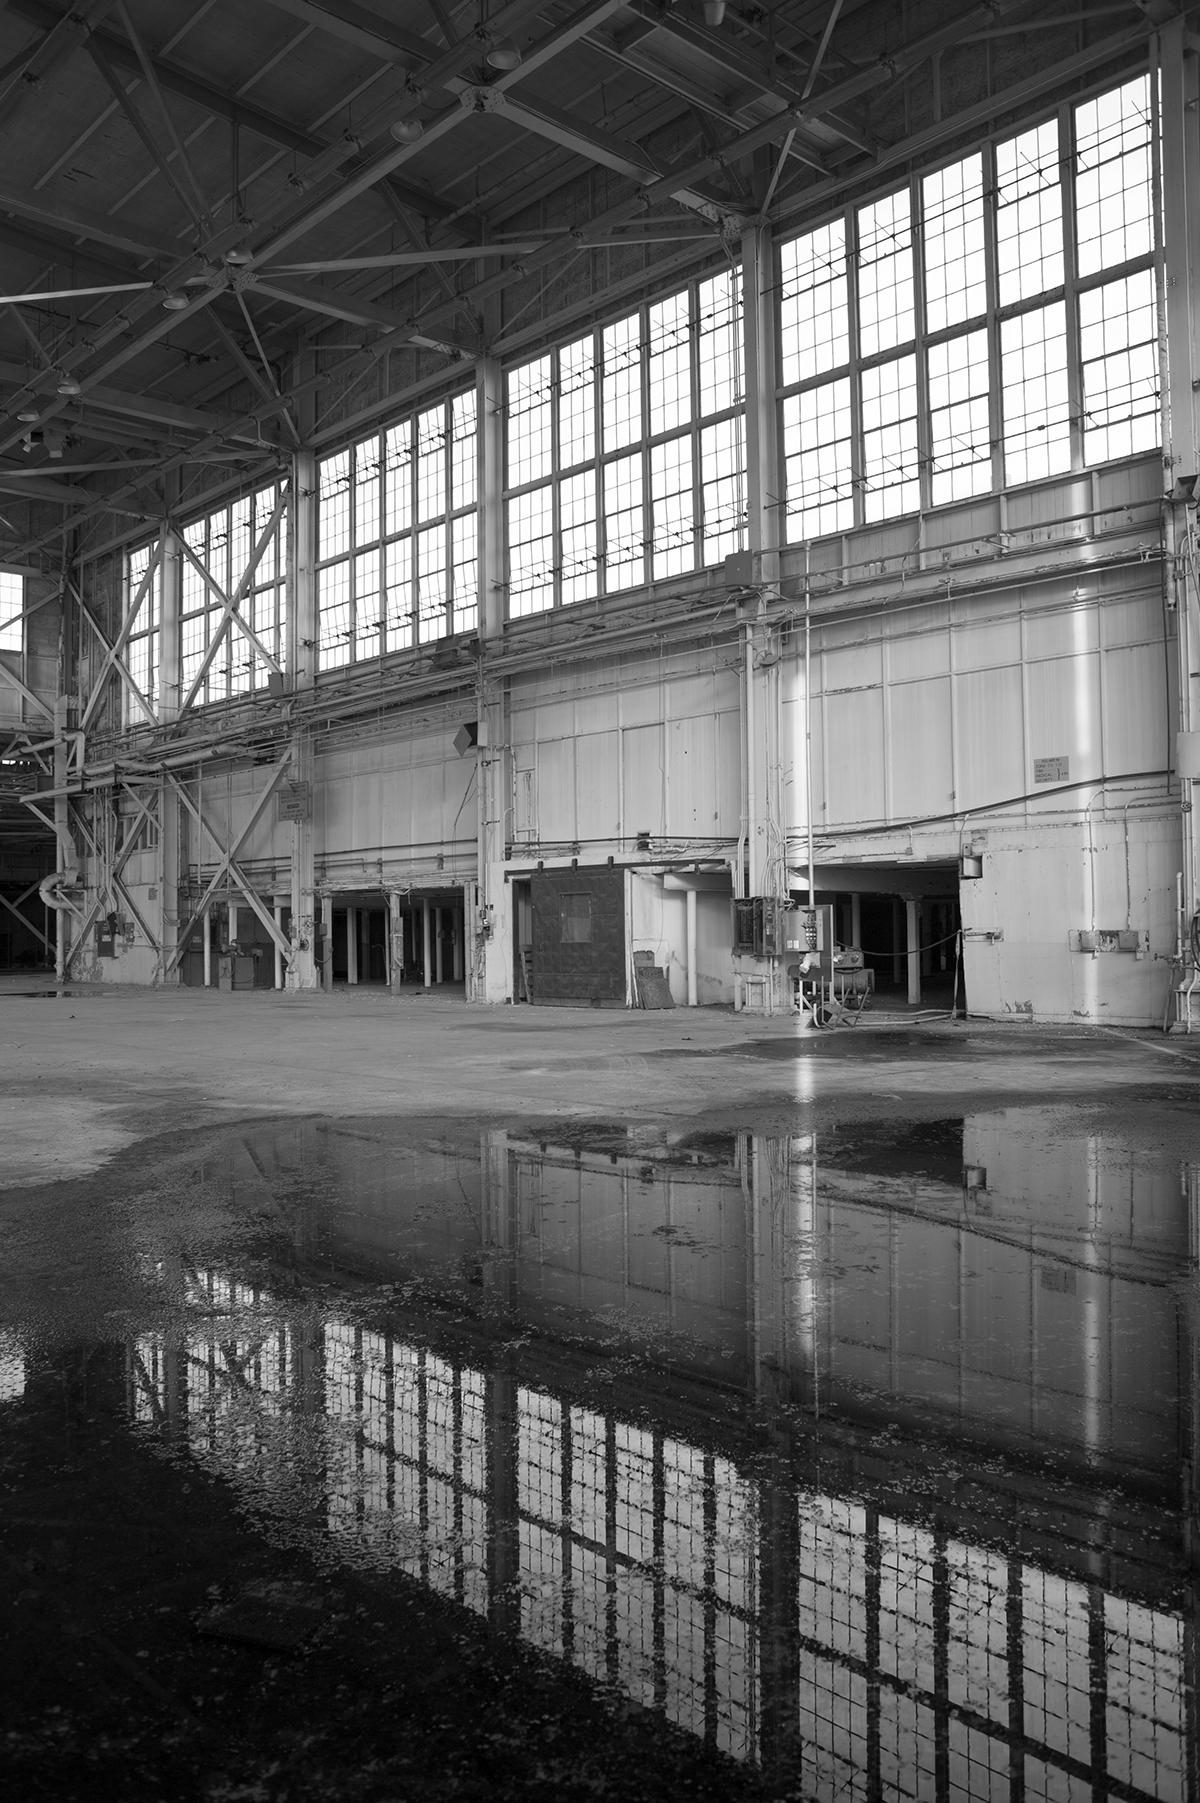 hangar_interiorBW_merged_small.jpg